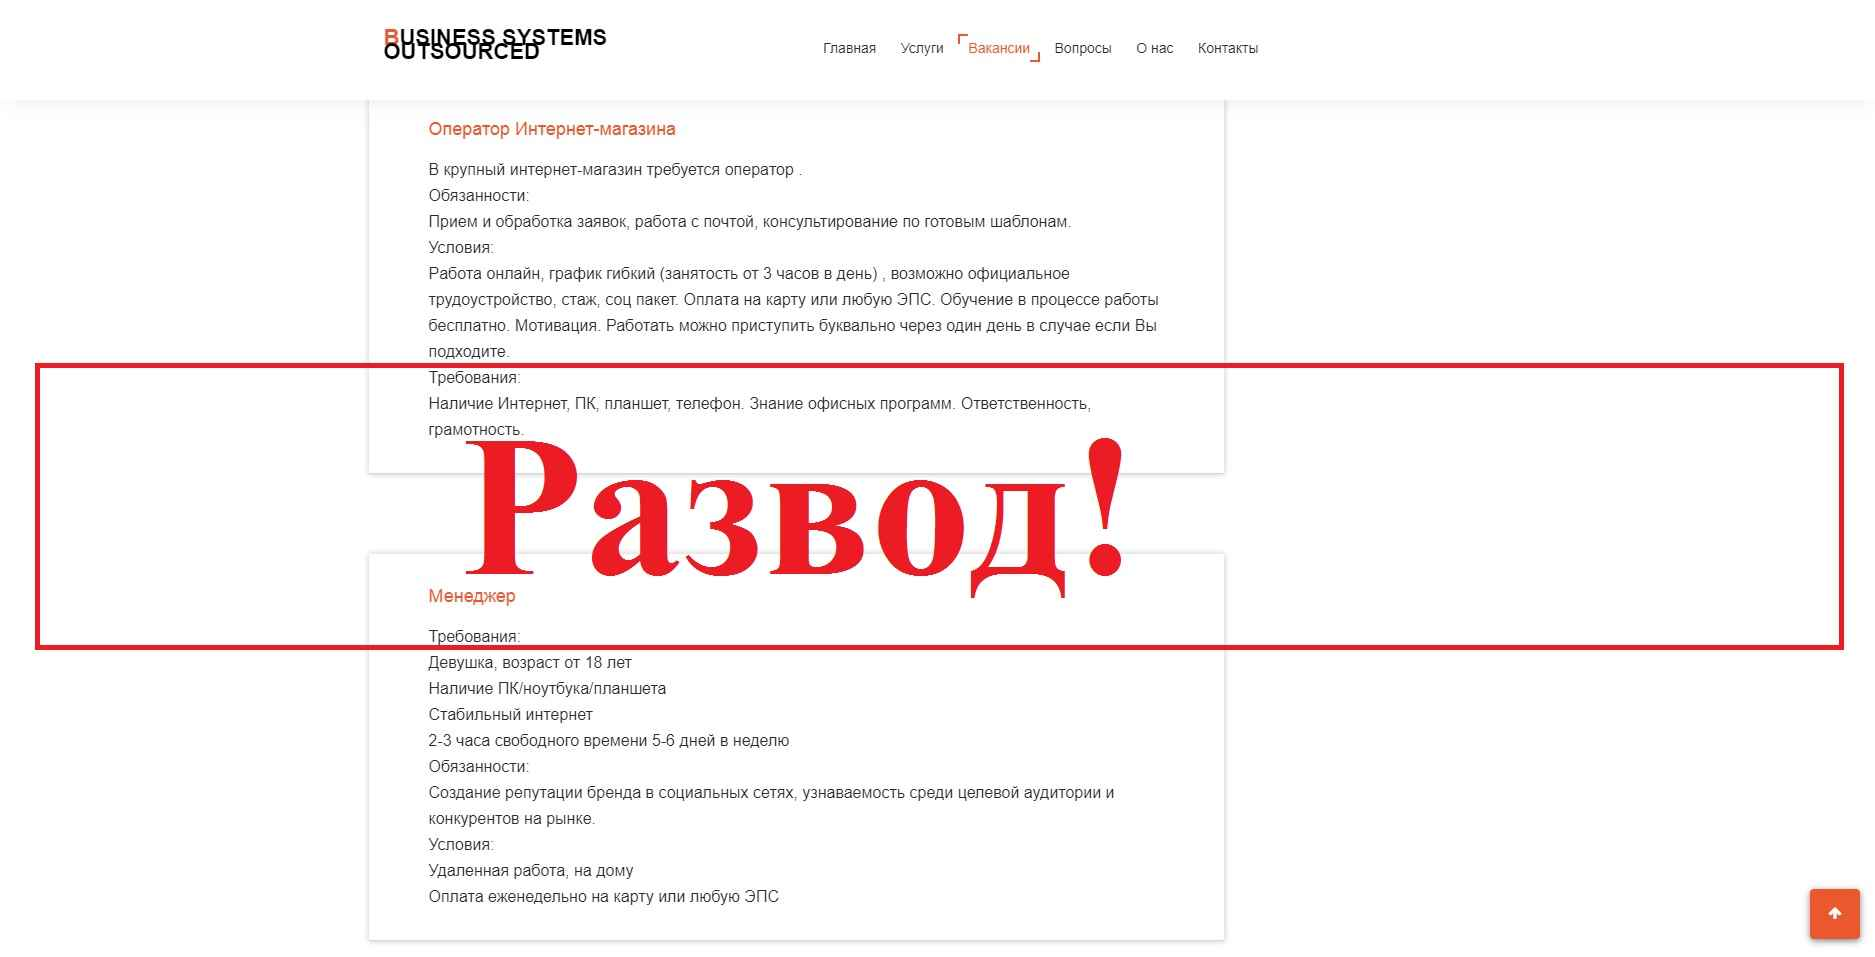 карта отзывы сотрудников банки томска кредит онлайн заявка